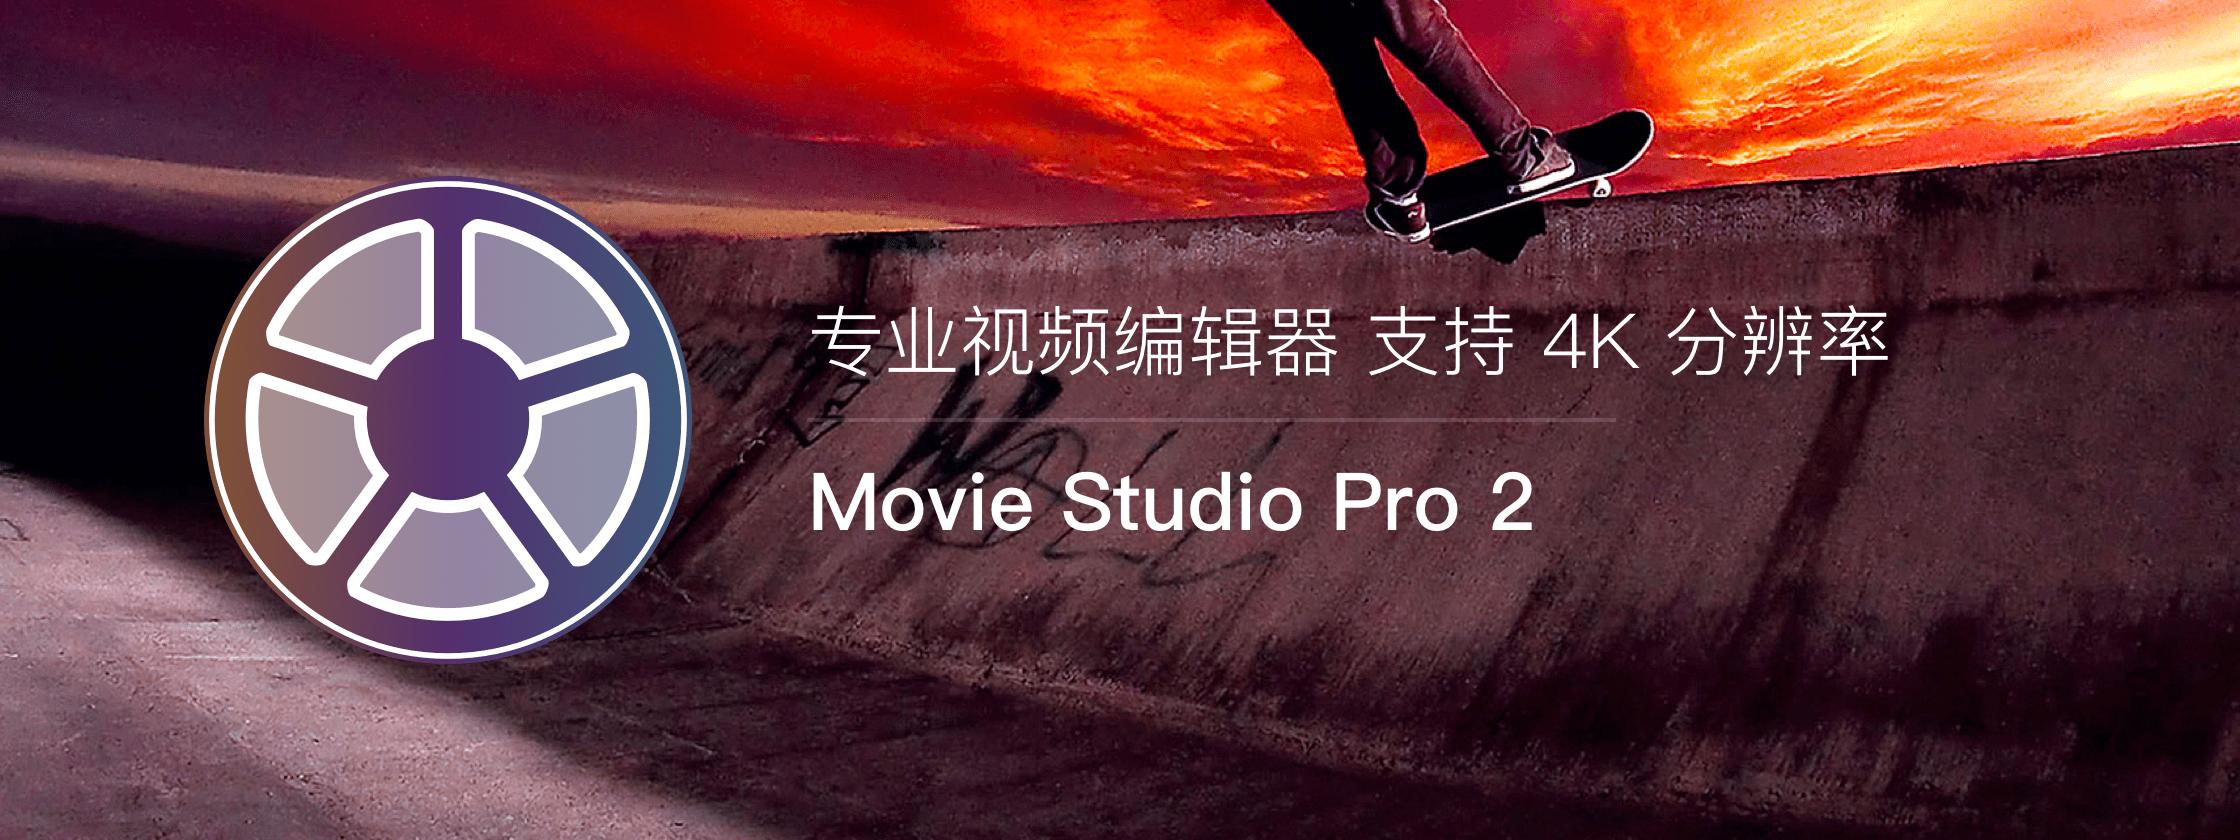 Movie Studio Pro,专业视频编辑工具,支持 4K 分辨率